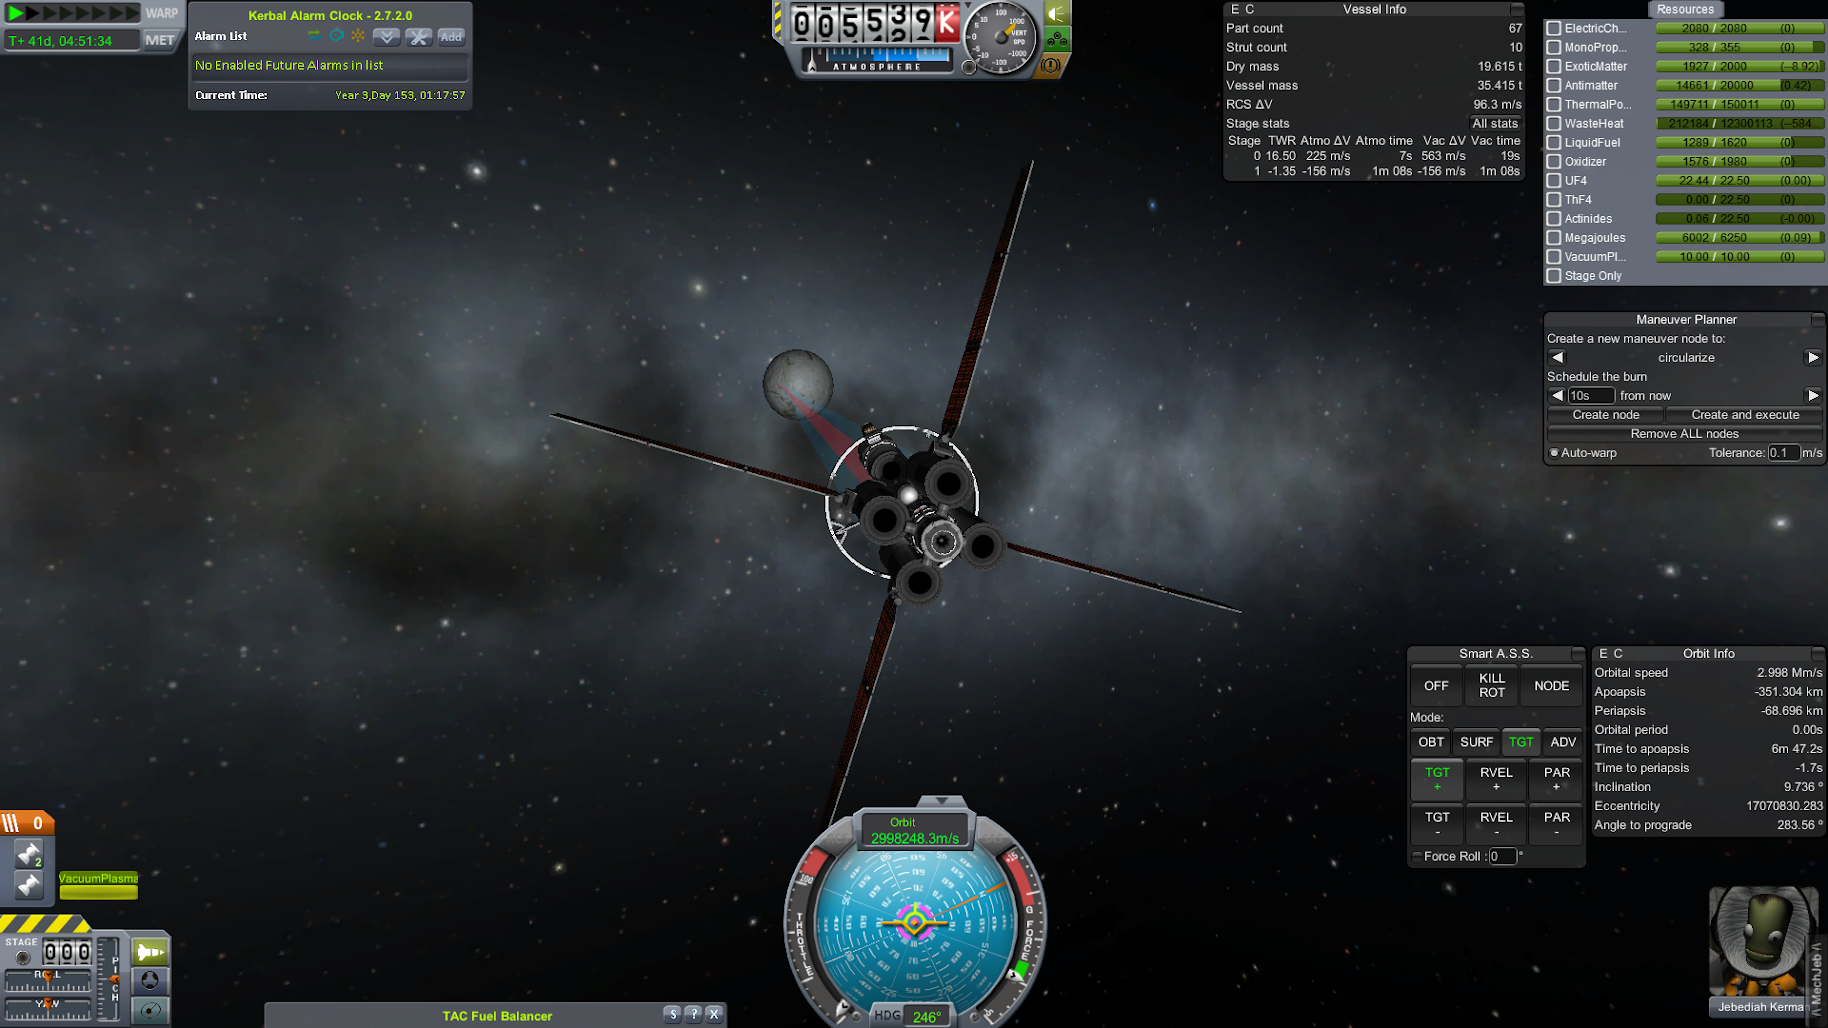 screenshot110.png